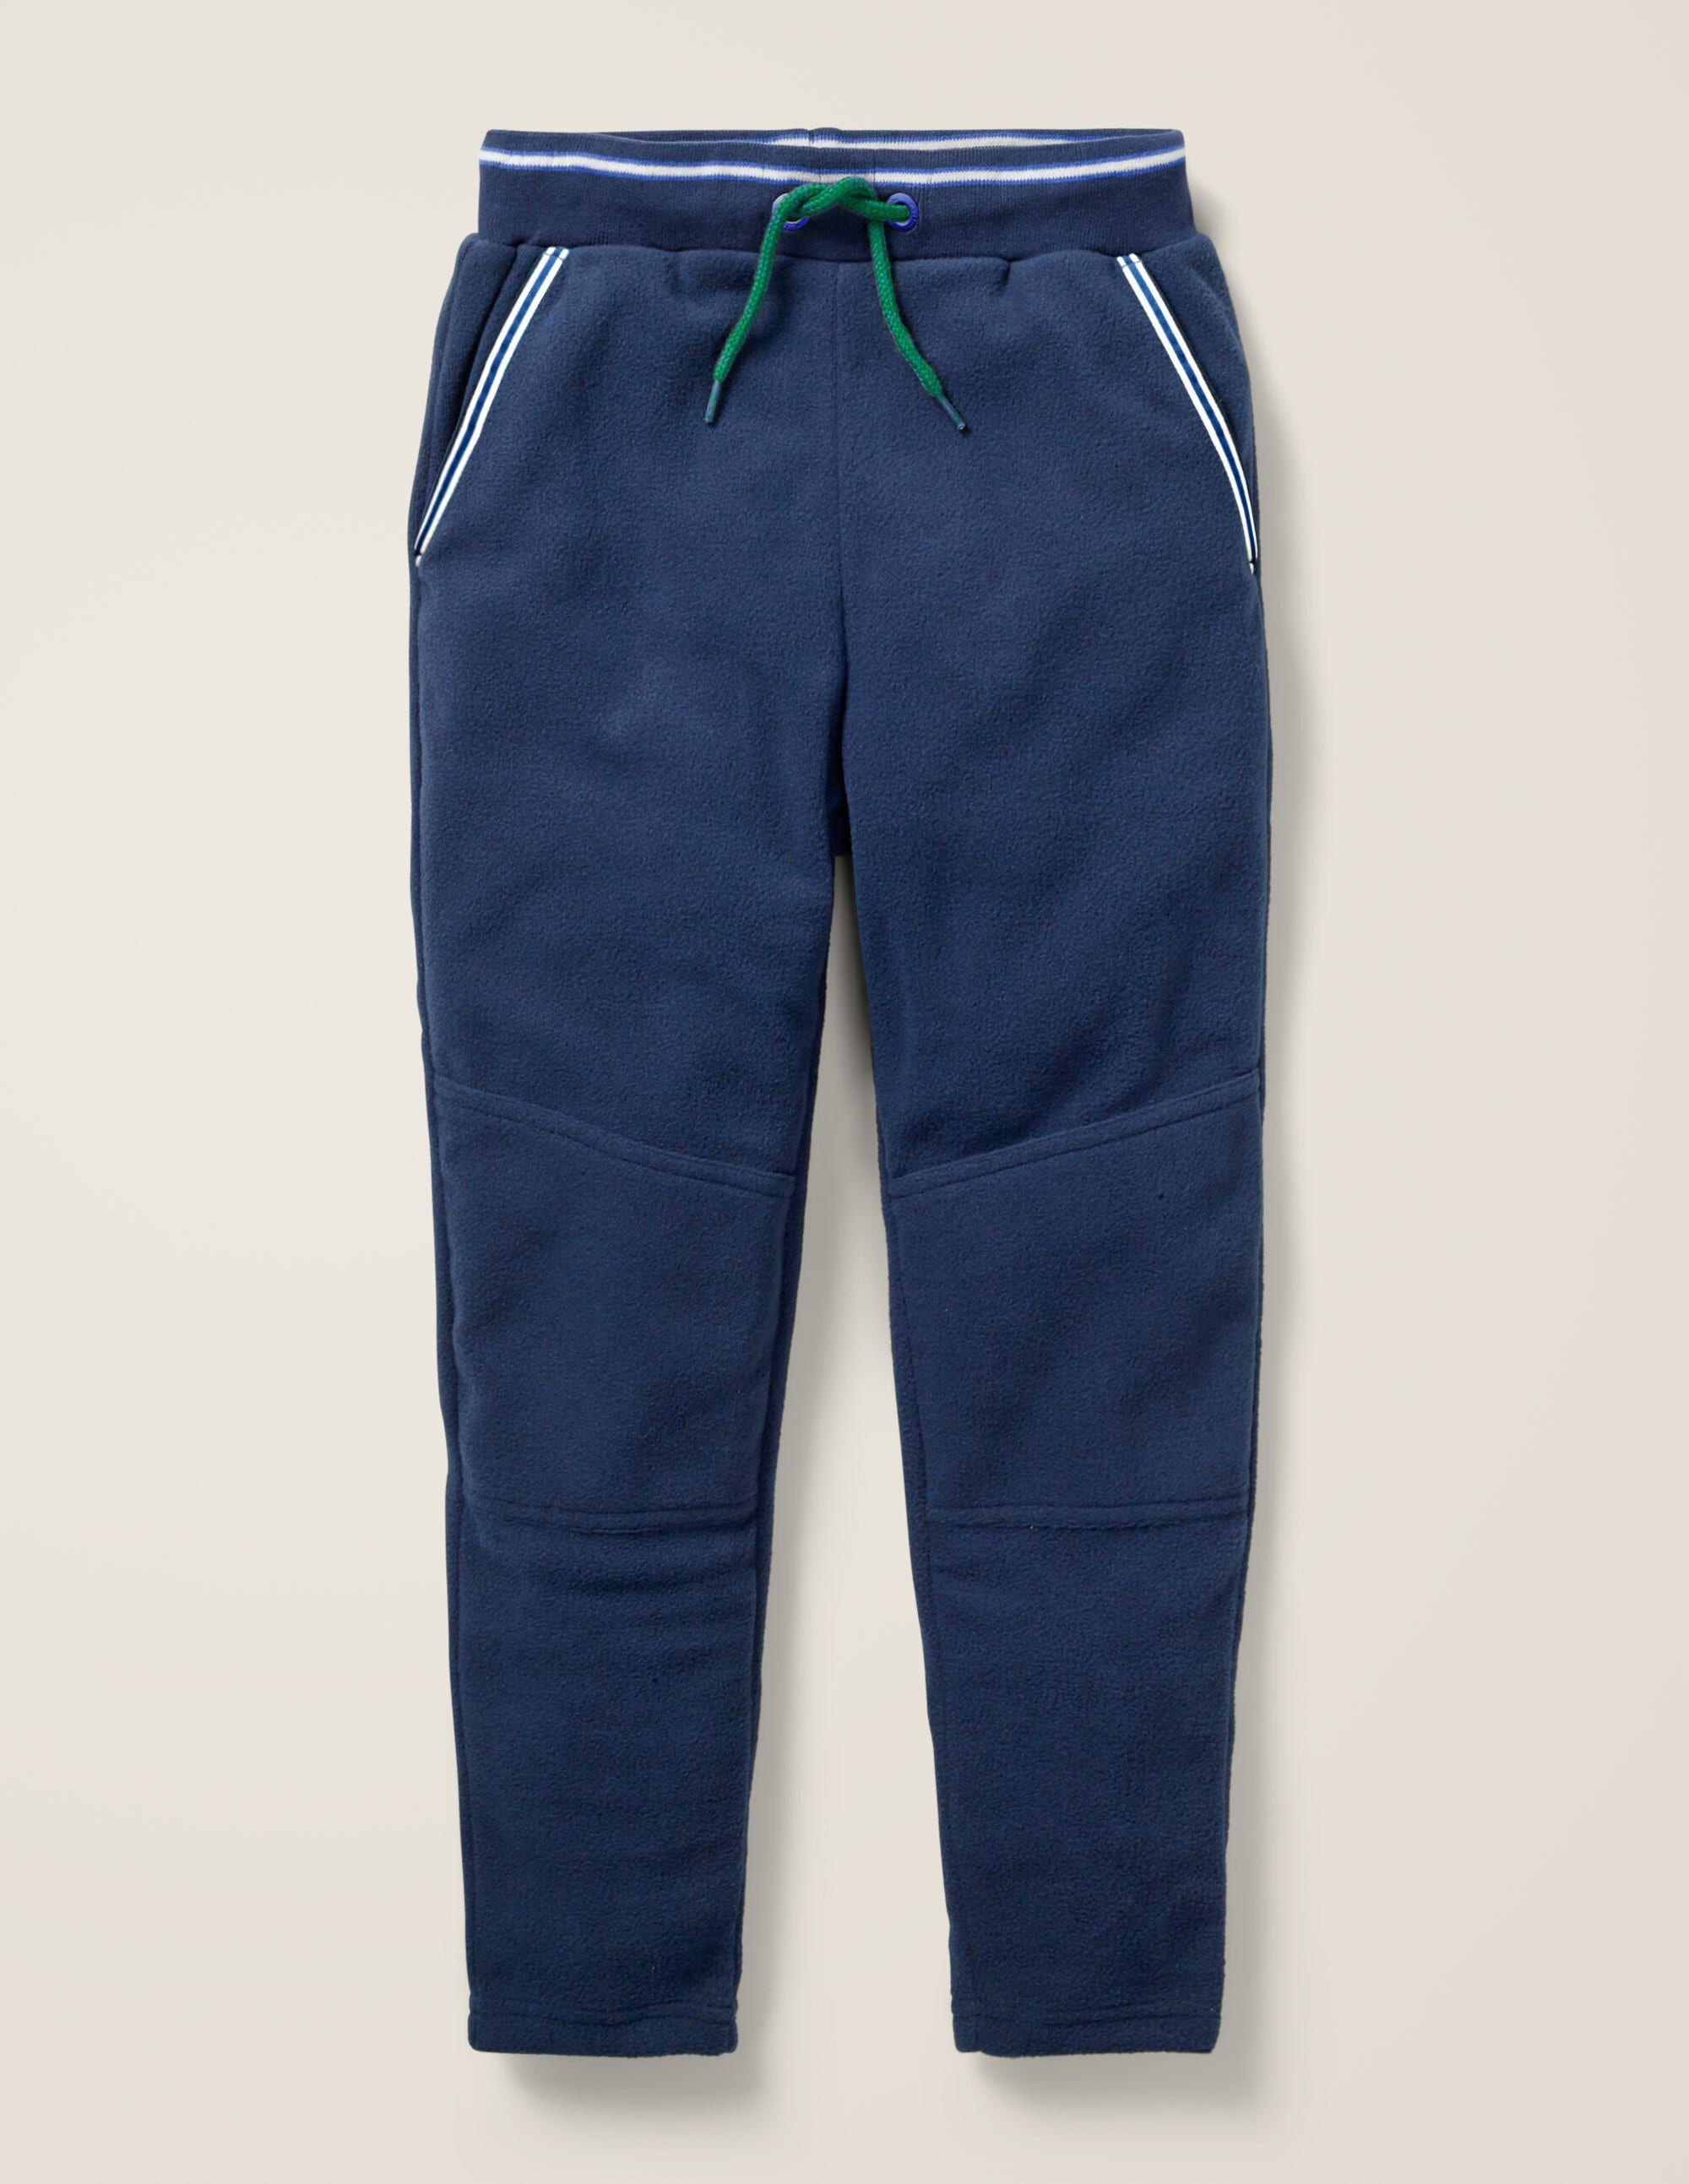 Mini Pantalon de survêtement en micro-polaire BLU Garçon Boden, Blue - 12a